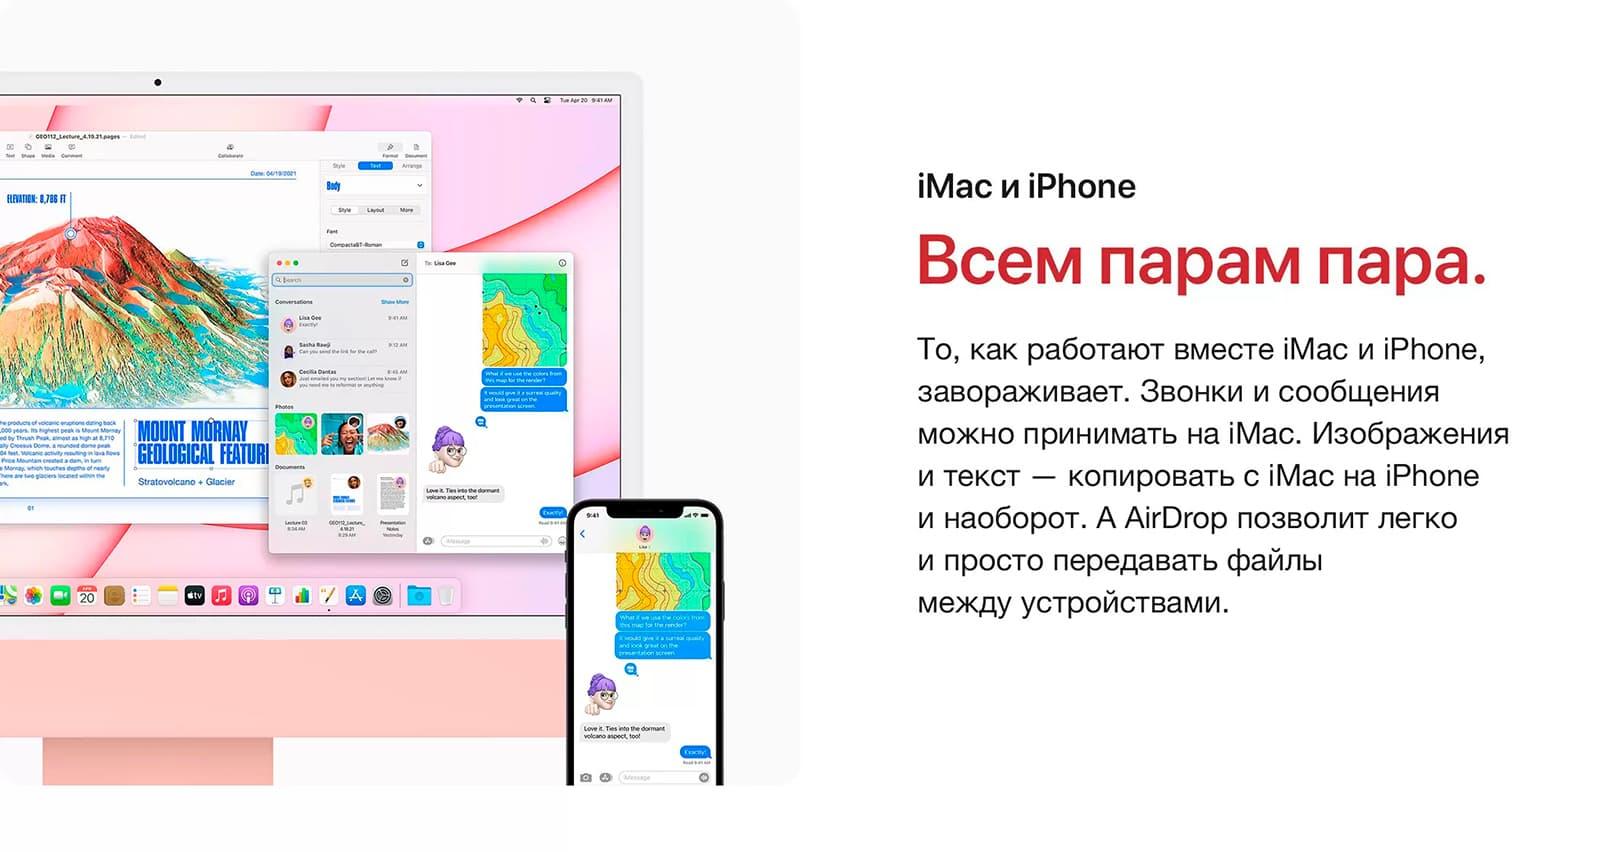 iMac и iPhone